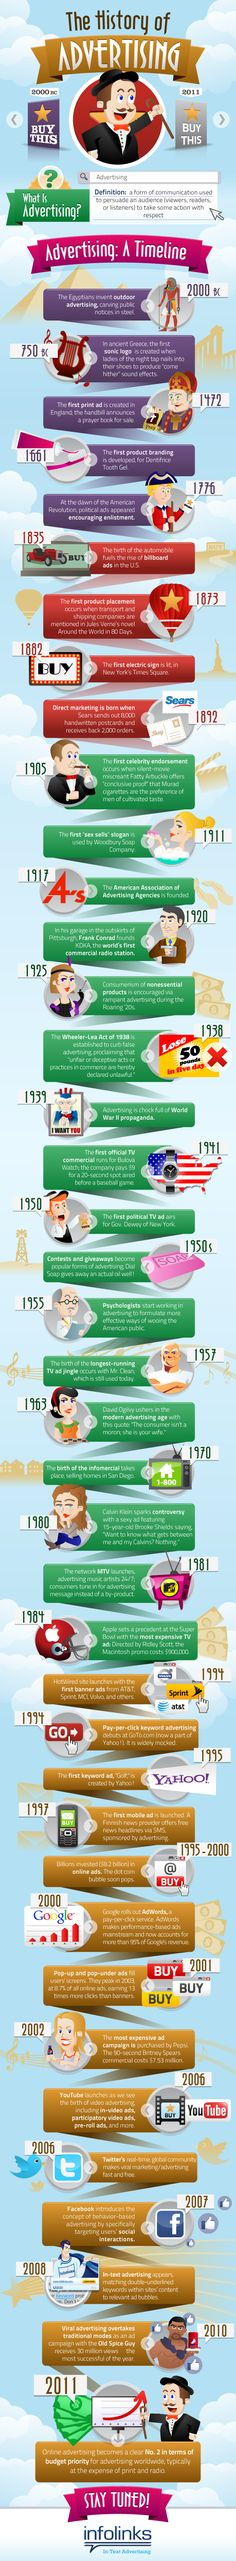 [#infografica] Storia dell'#Advertising